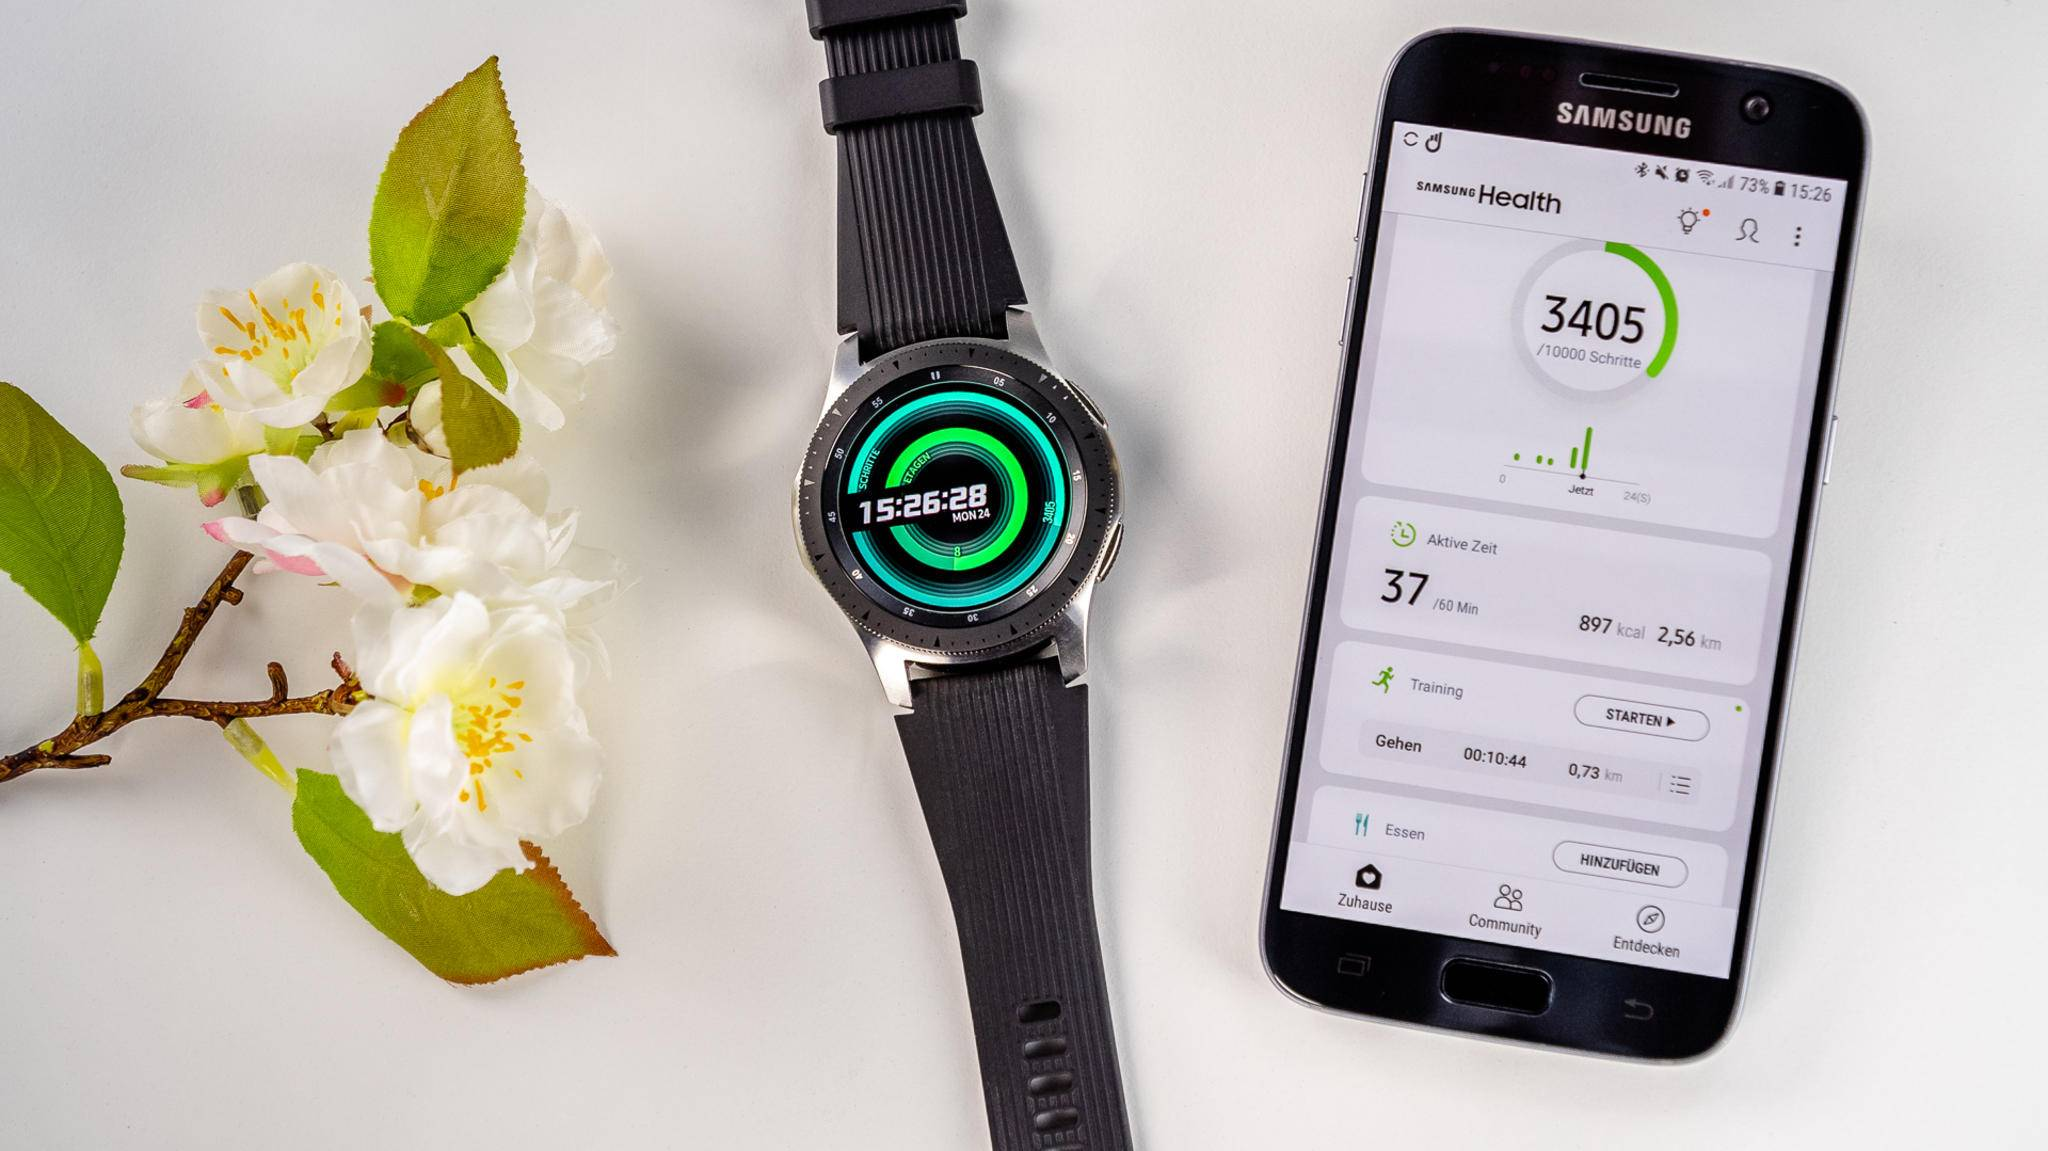 Samsung Galaxy Watch 9